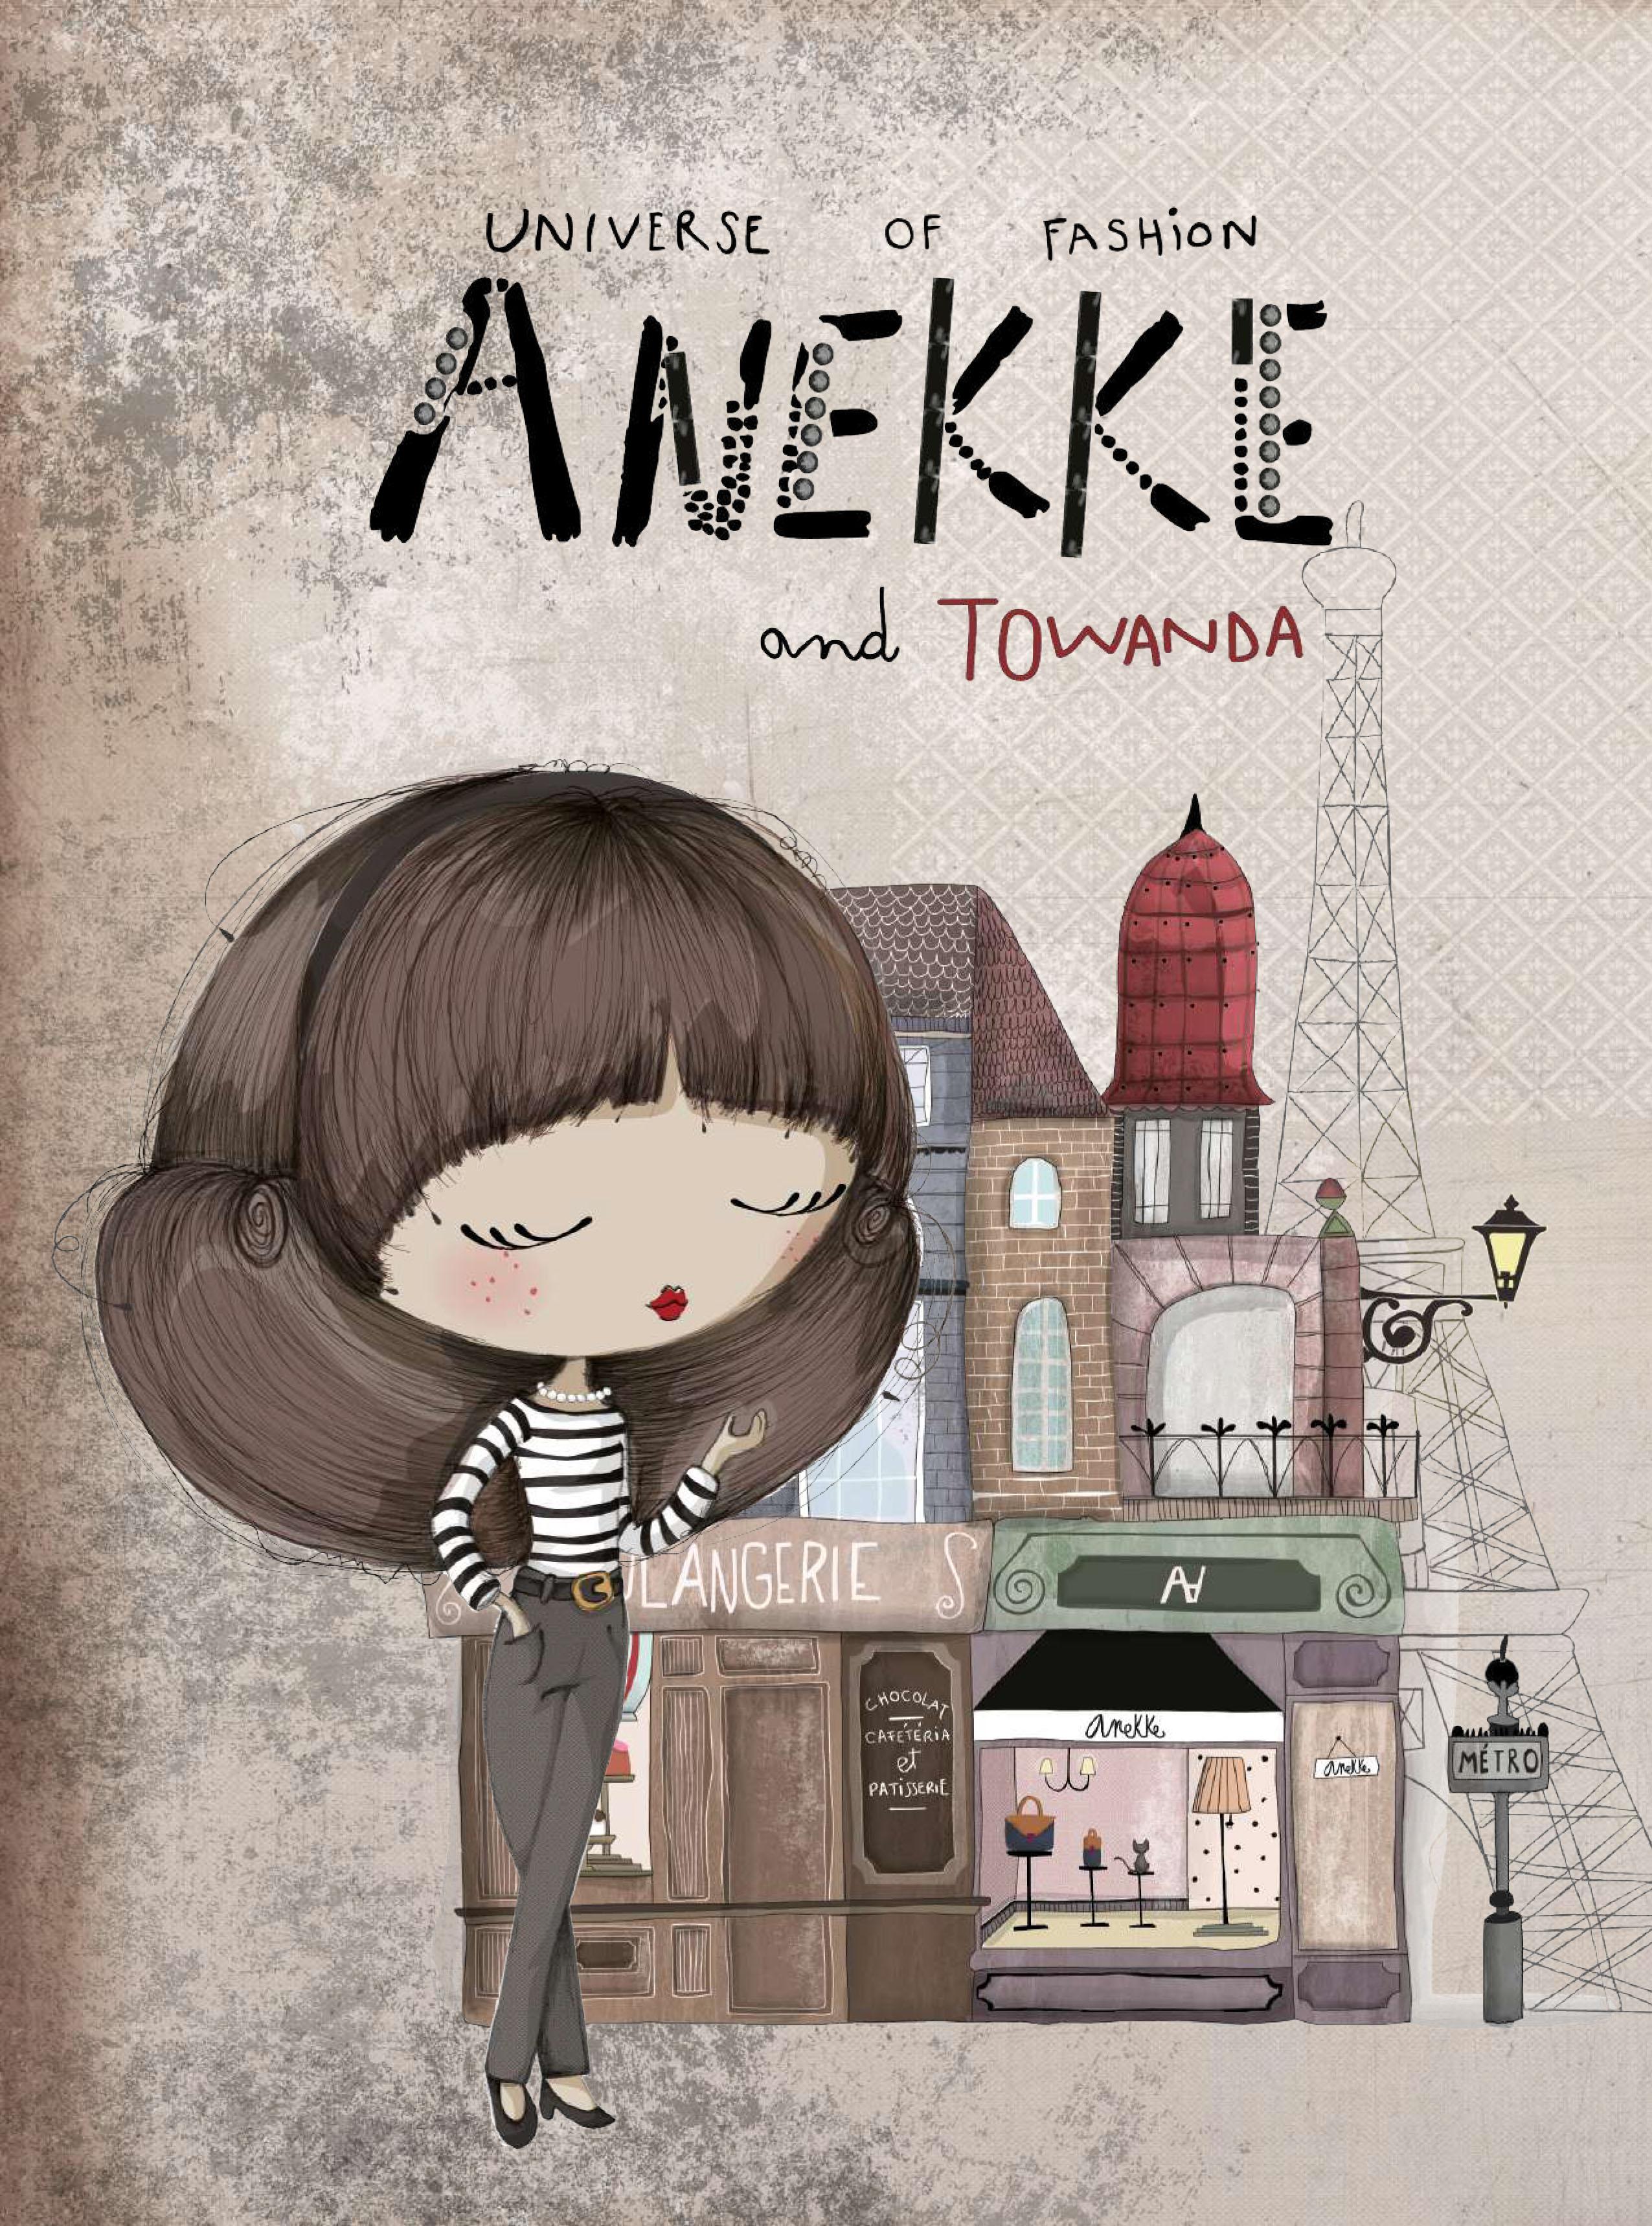 Universe-of-Fashion-Anekke-and-Towanda